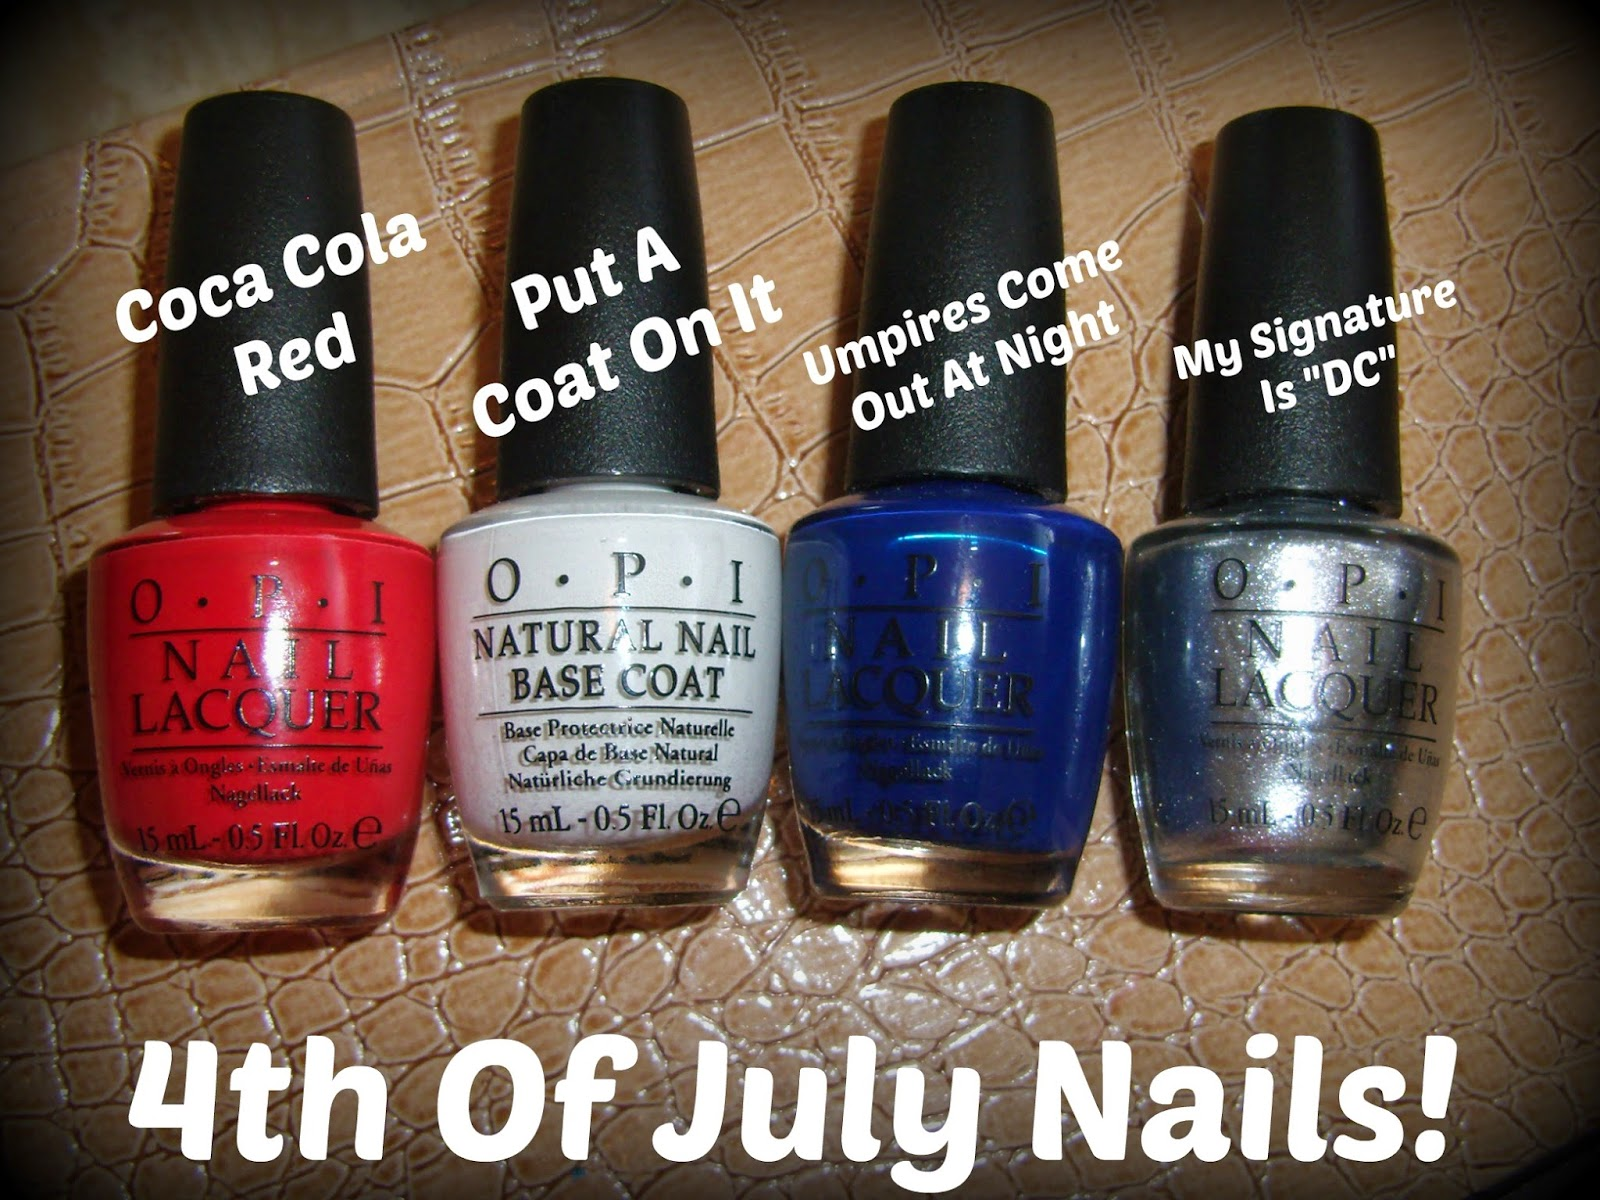 Obsessive Cosmetic Hoarders Unite 4th Of July Nail Art